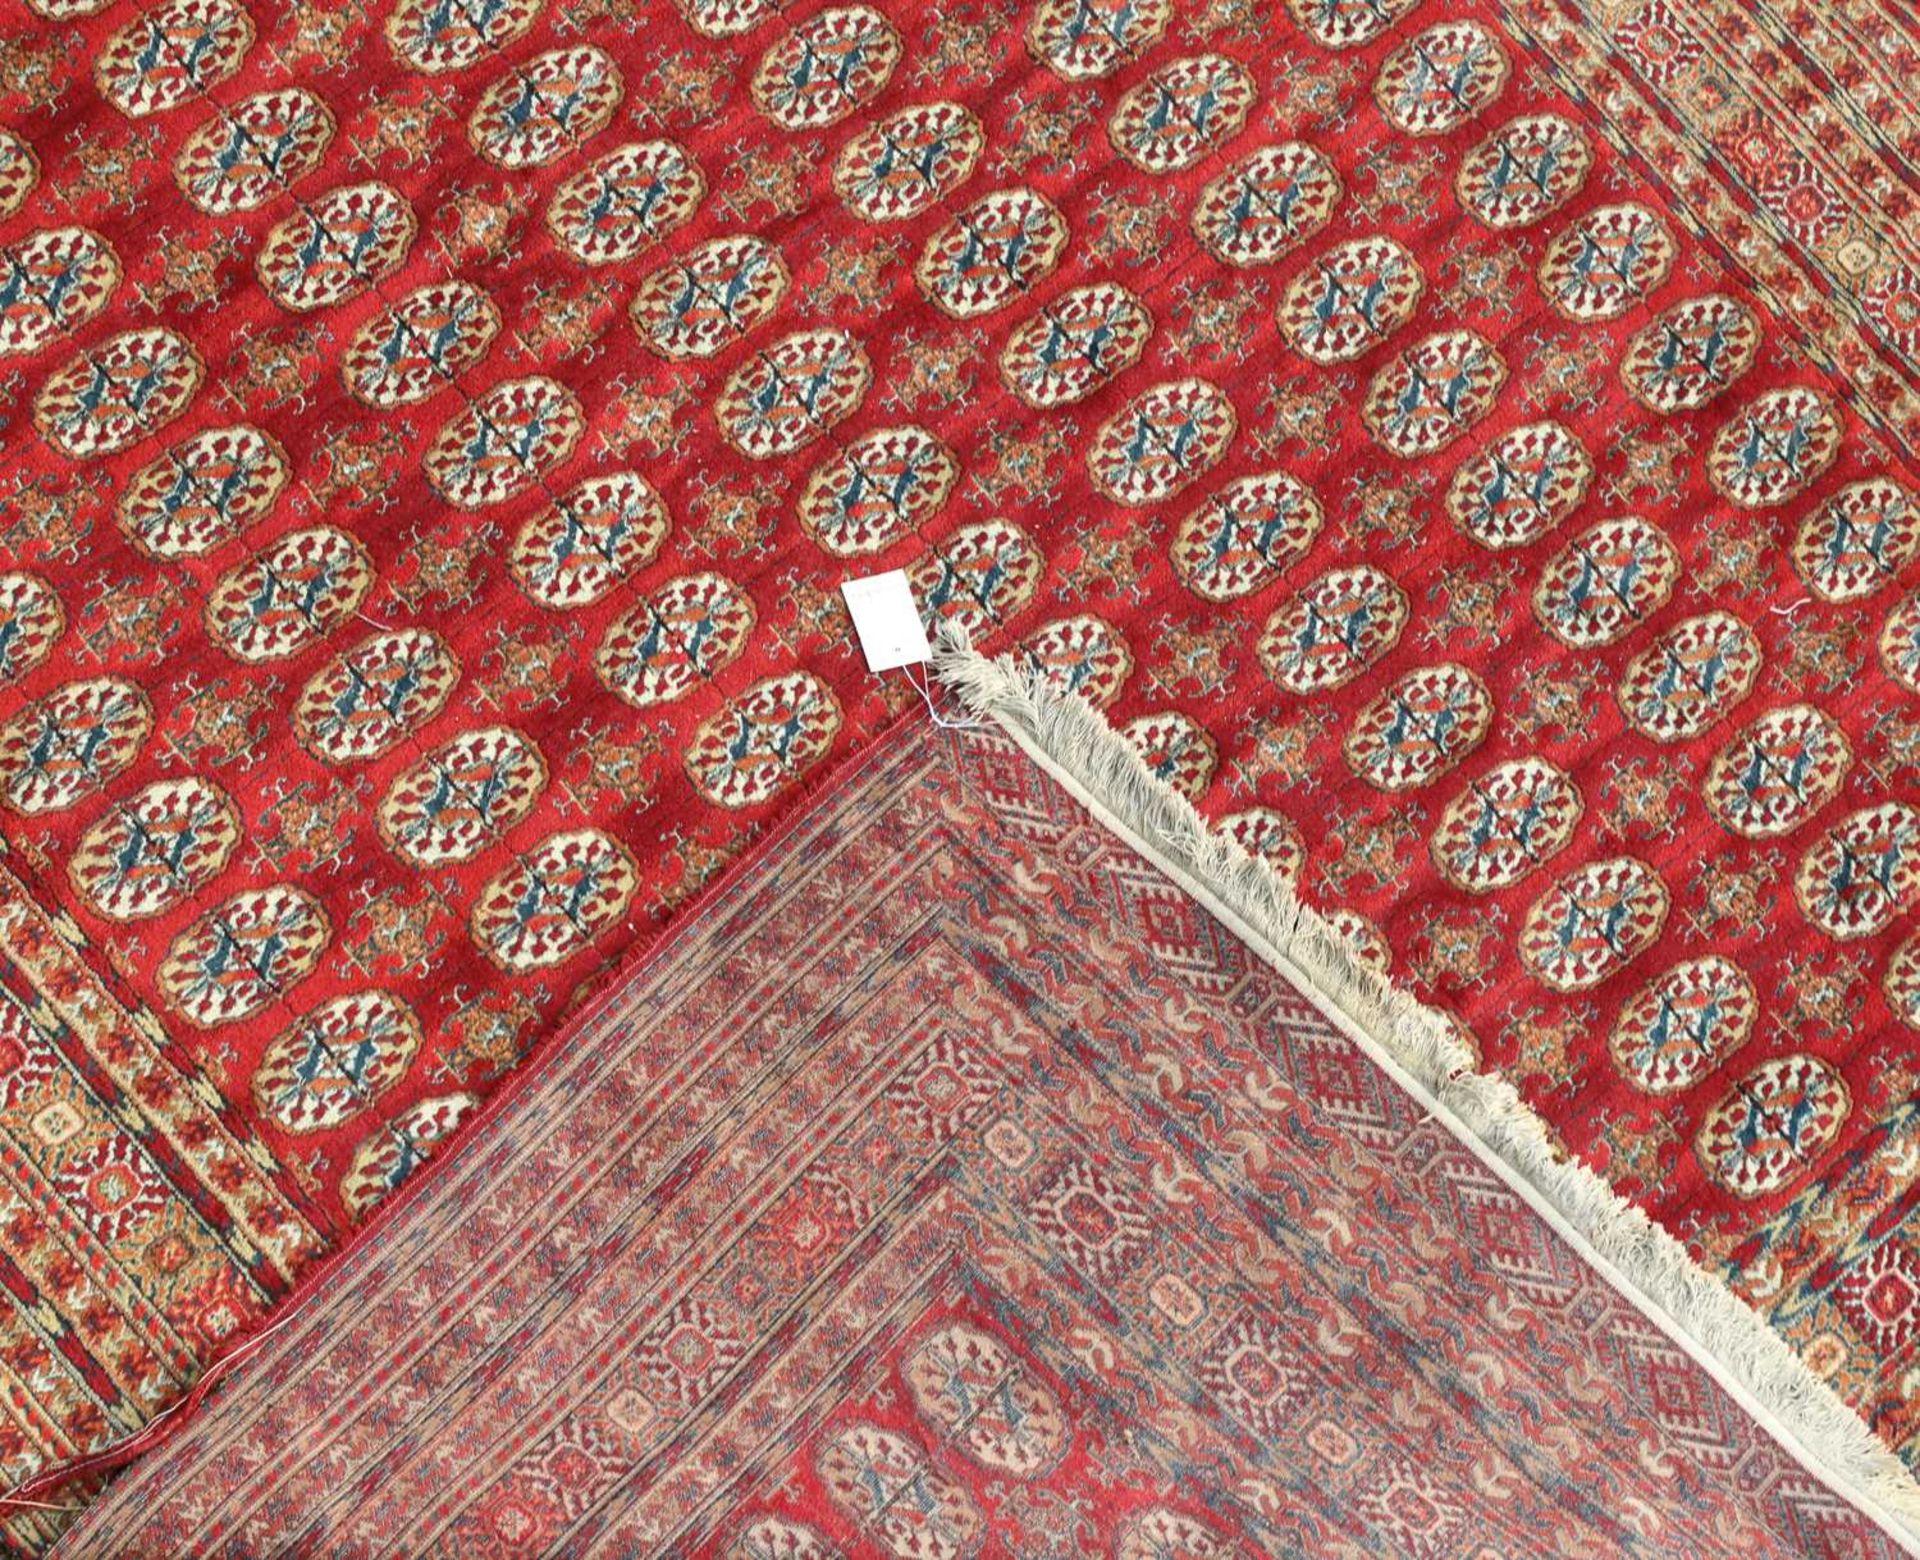 An Afghan carpet of Bokhara design, - Image 2 of 2